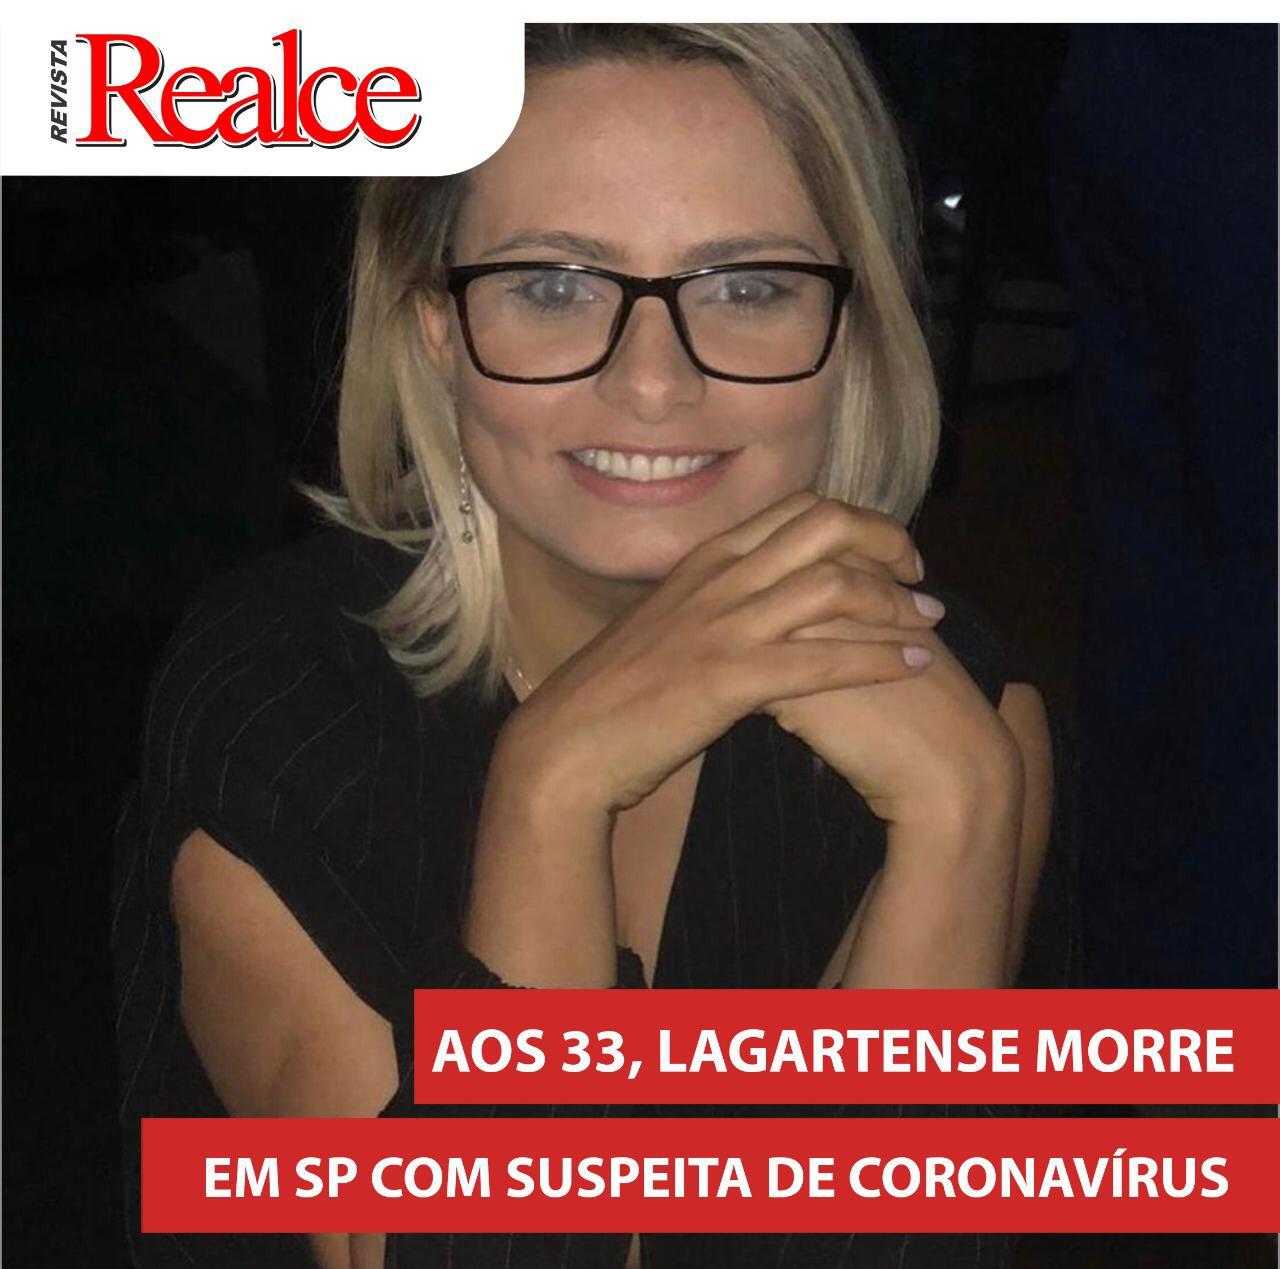 CORONAVÍRUS: LAGARTENSE MORRE EM SÃO PAULO